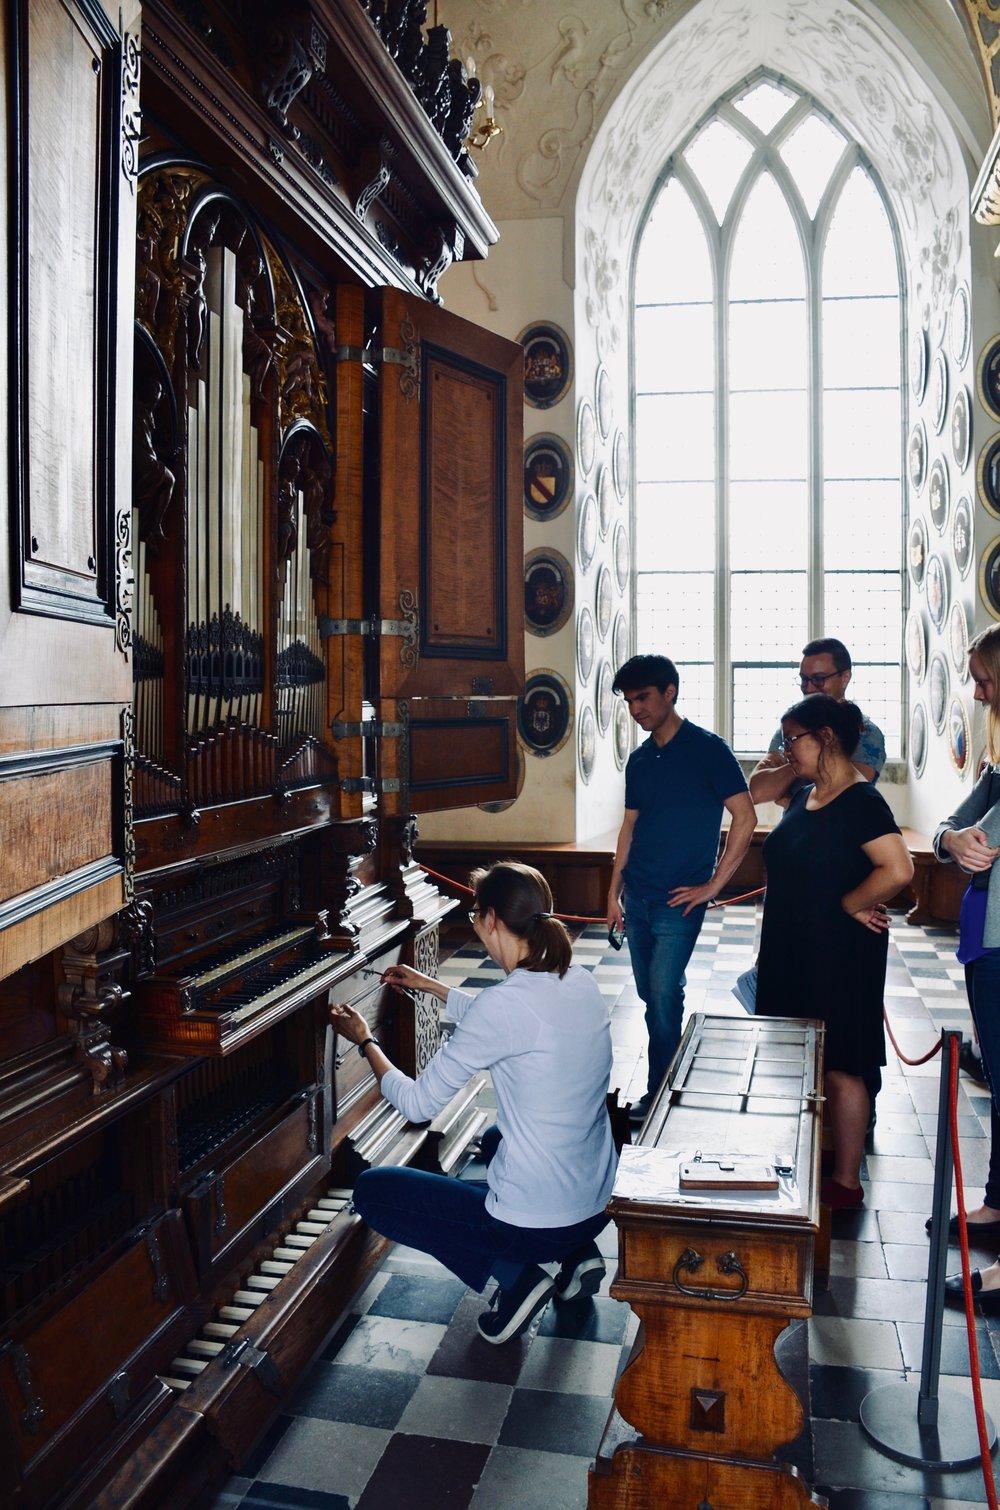 Castle organist Bine Bryndorf locks compartments of the 1610 Compenius organ, Frederiksborg Castle, Hillerød, Denmark.